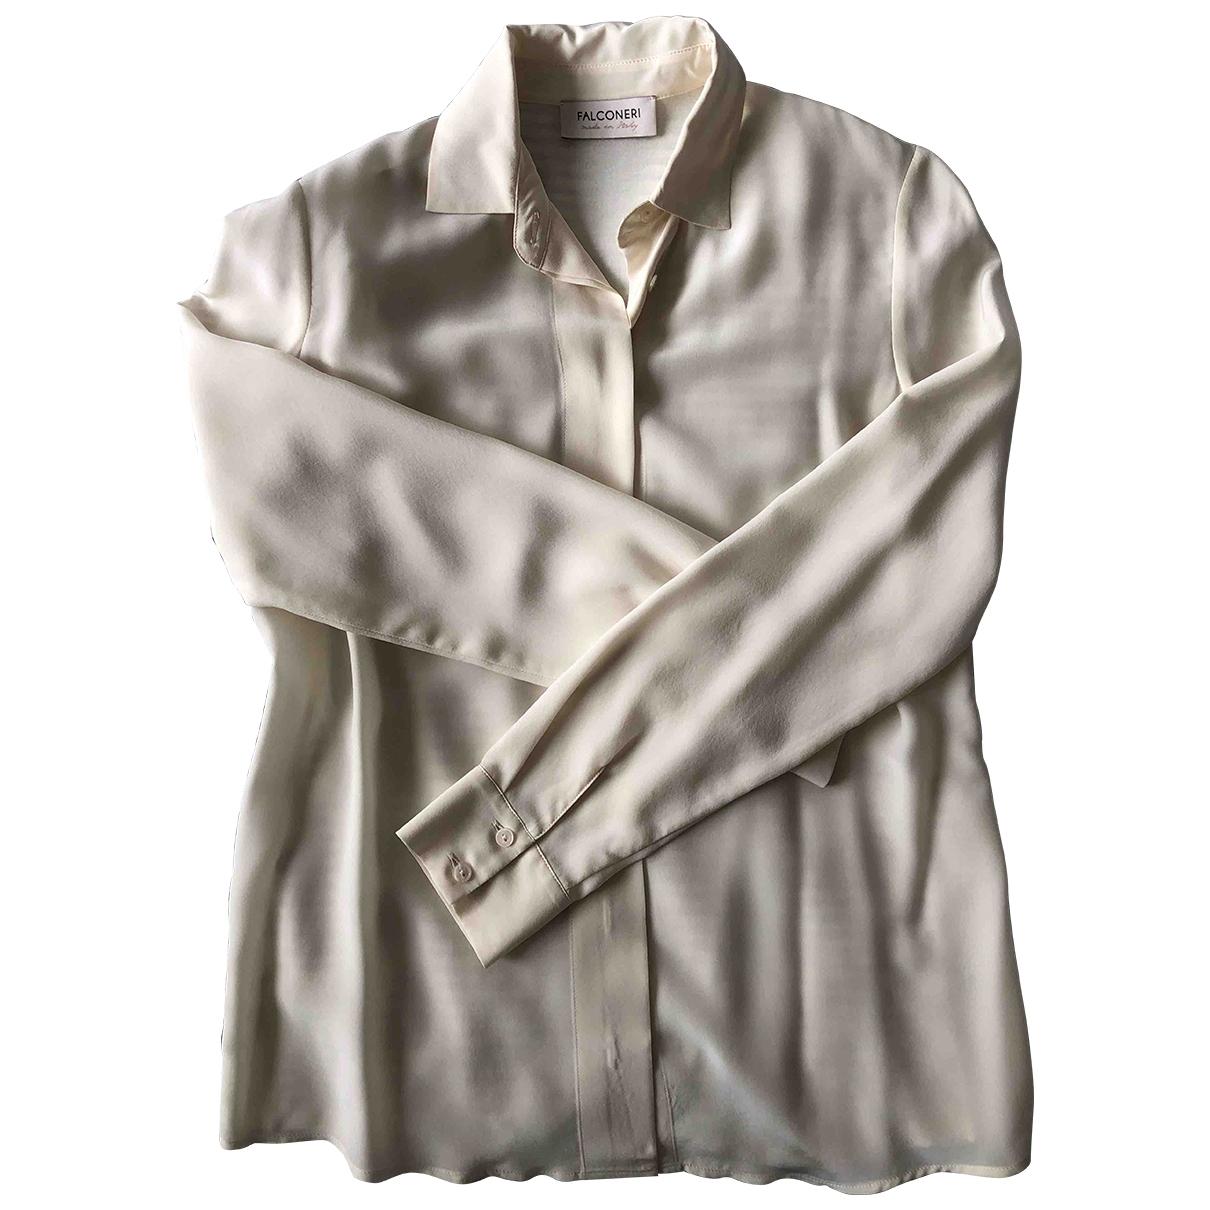 Camisa de Seda Falconeri